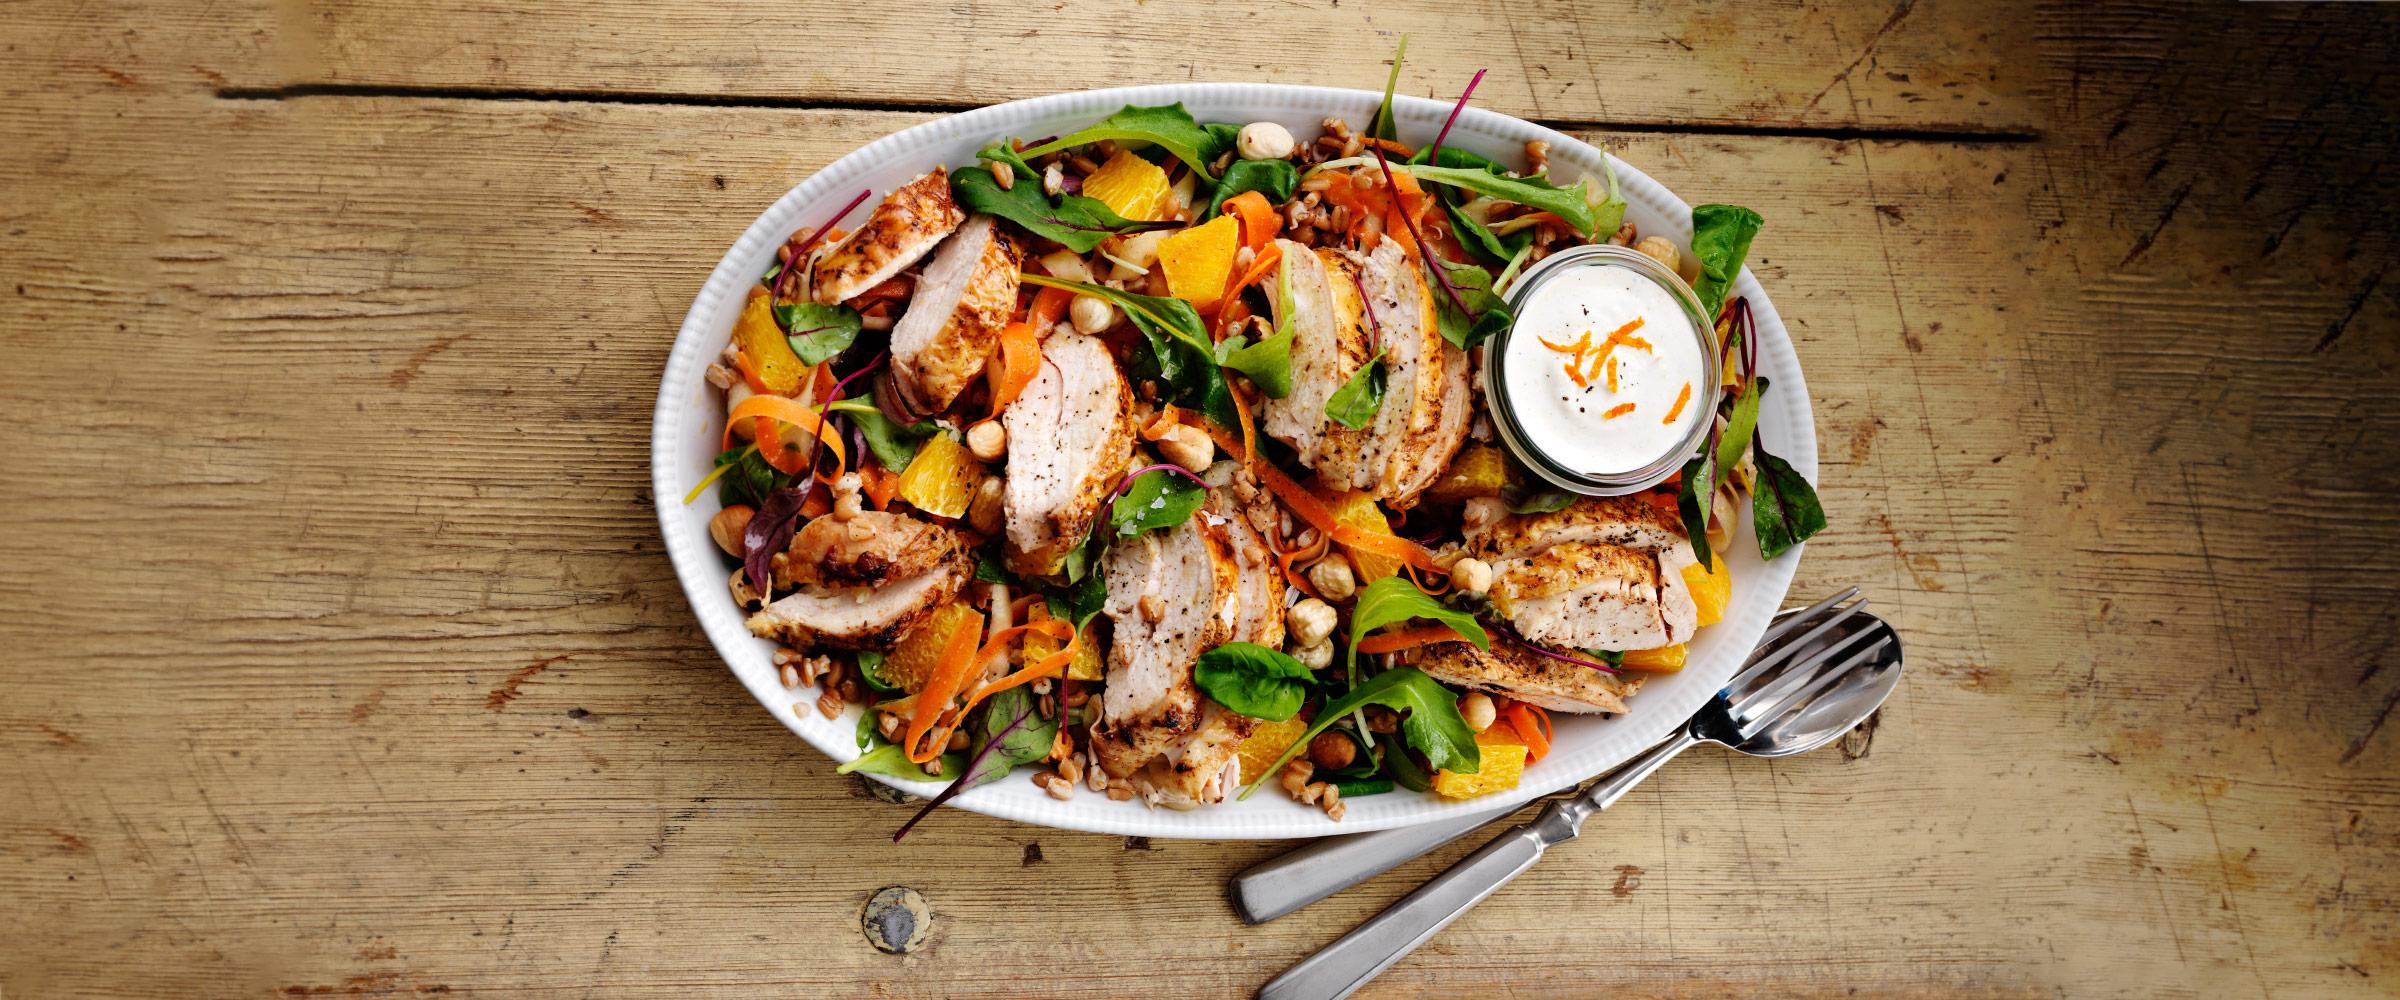 grillad kyckling sallad recept